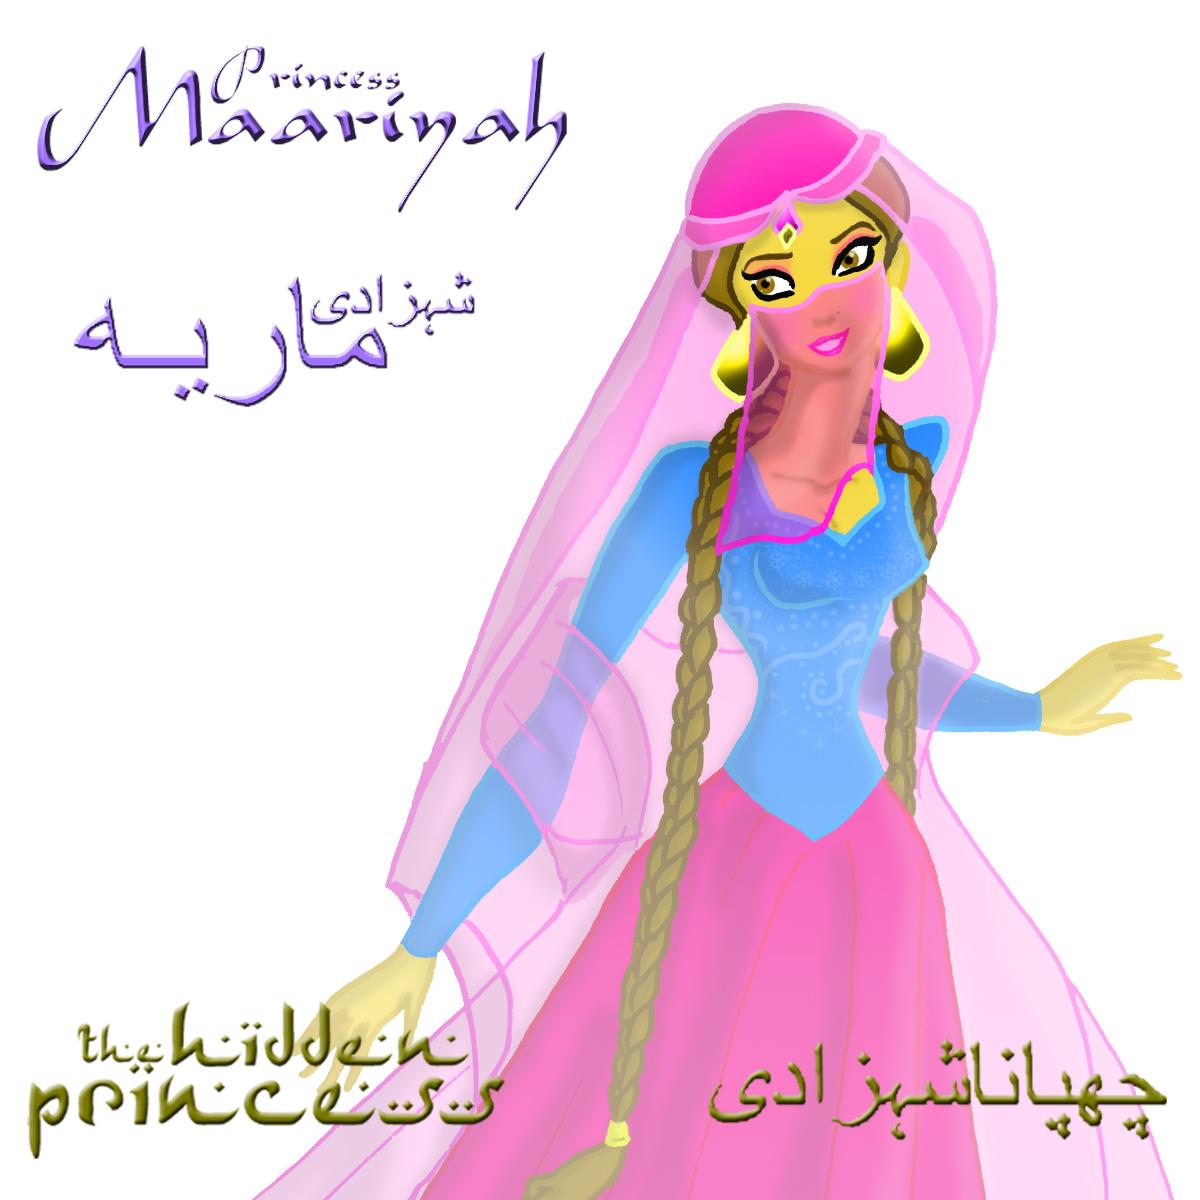 Disney Princess Maariyah by ArsalanKhanArtist on DeviantArt